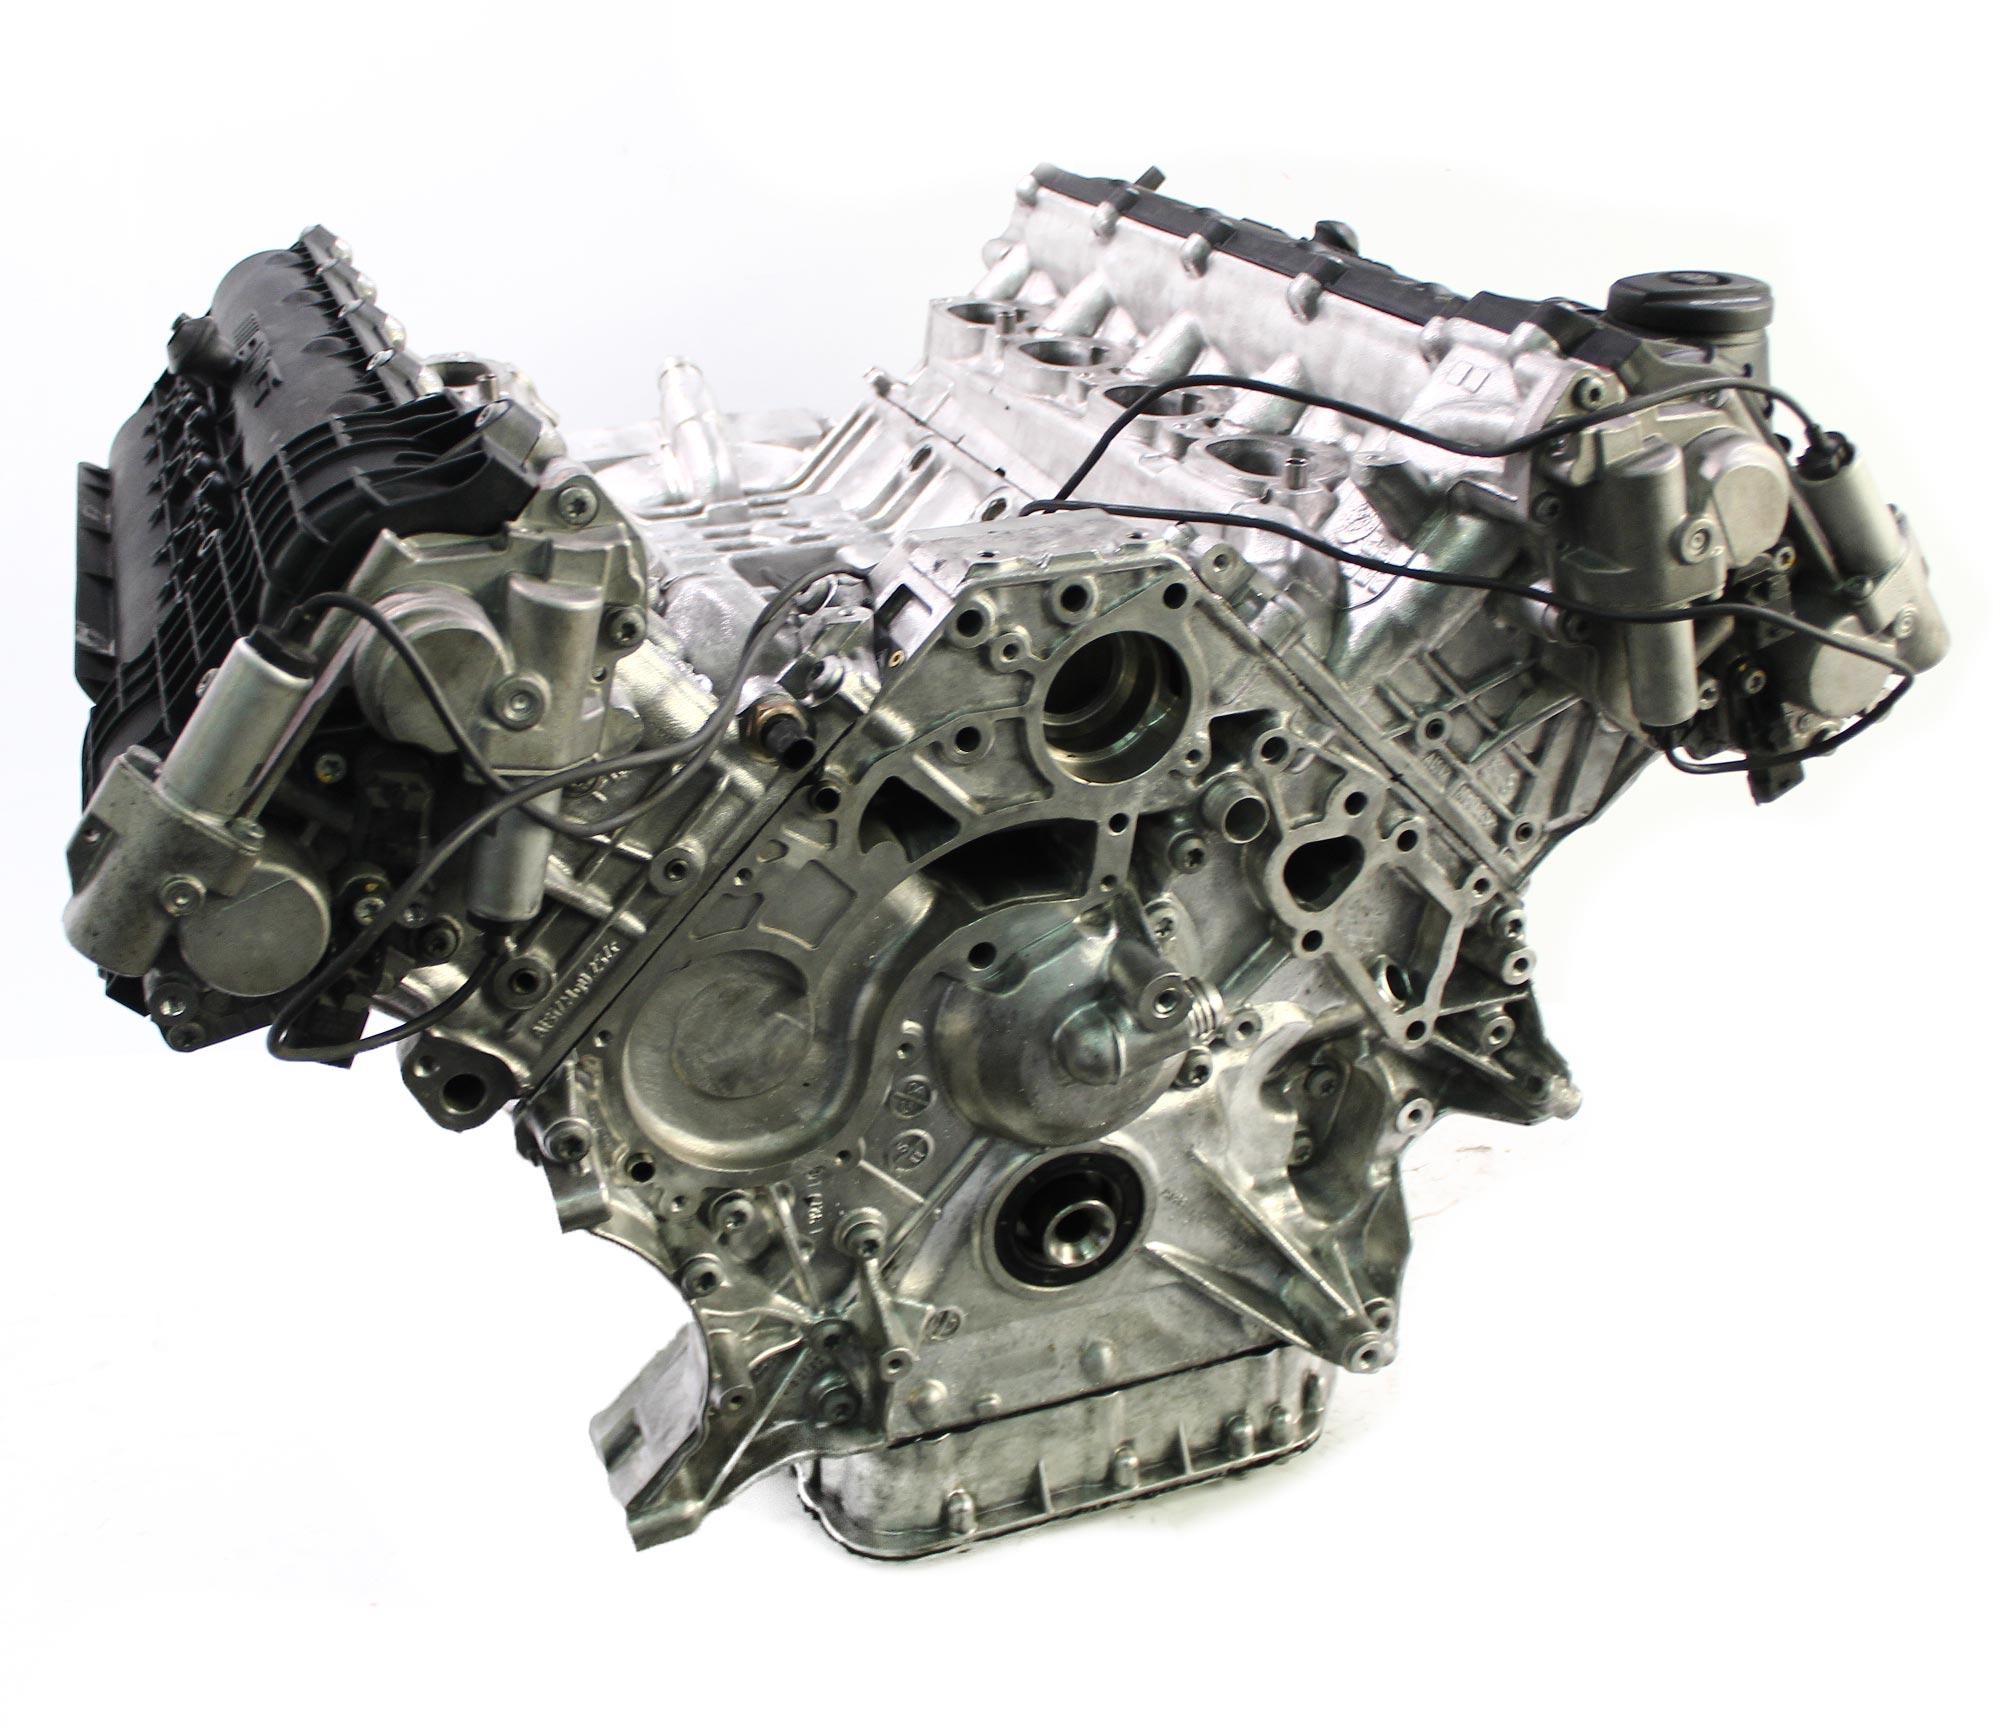 Motor 2012 Mercedes Benz C-Klasse W204 S204 C63 AMG 6,2 156.985 Kettensatz NEU